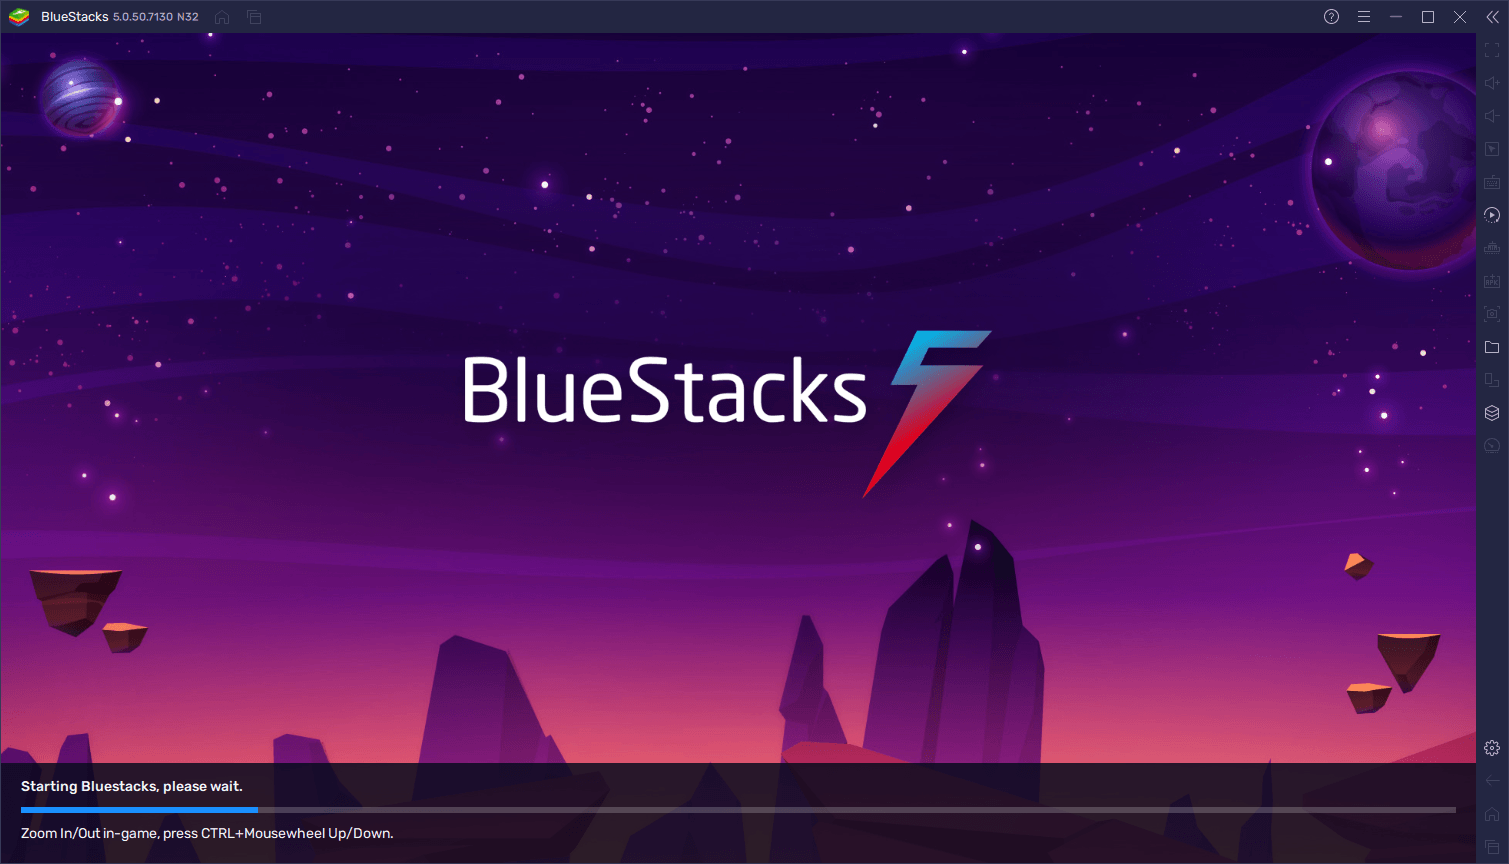 Full BlueStacks 5 screenshot